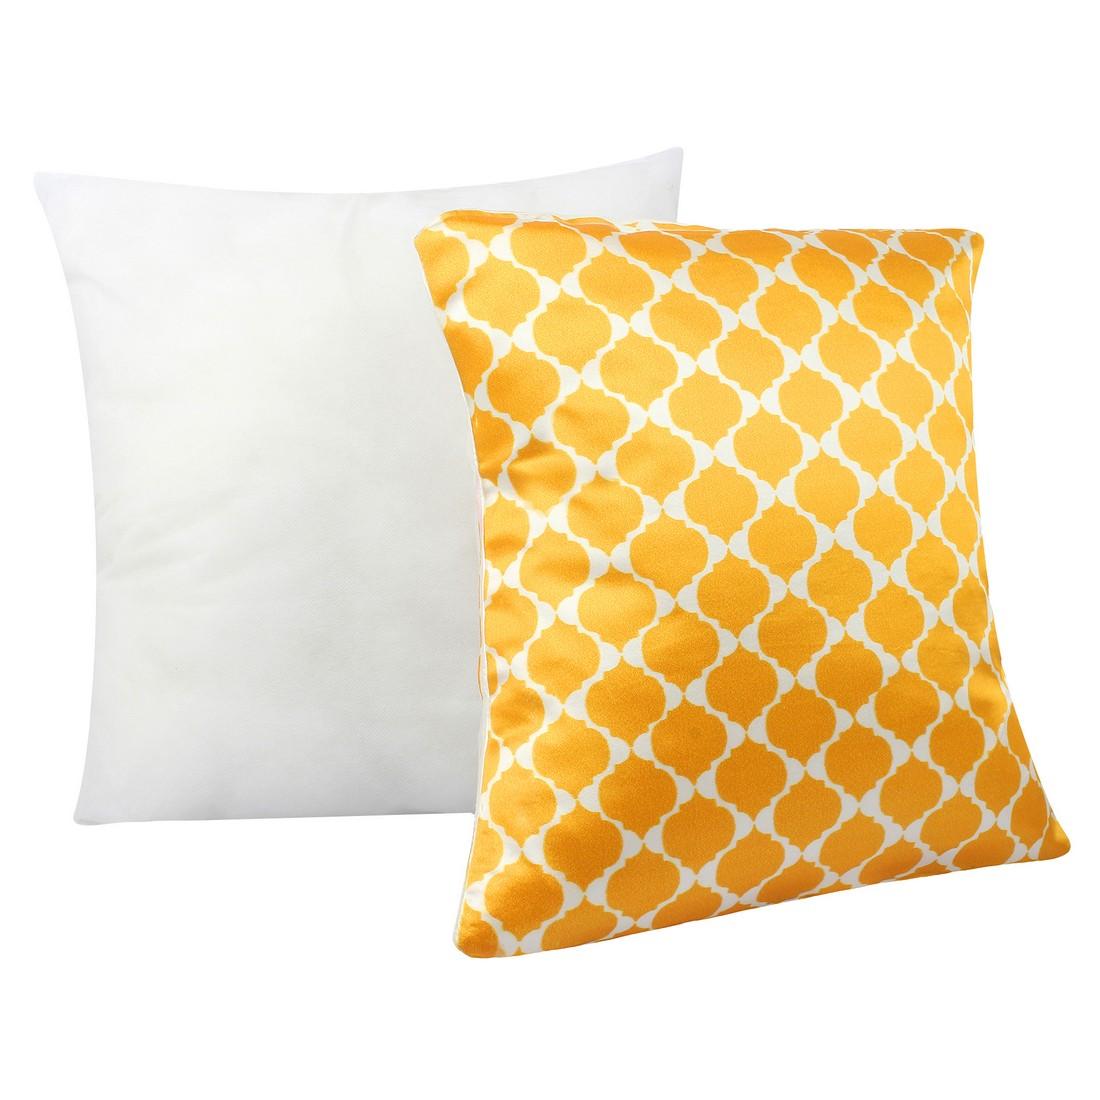 "Sattva Premium Digital Printed Cushion Cover CU01 With Filler Multicolor - Size 12""x12"""